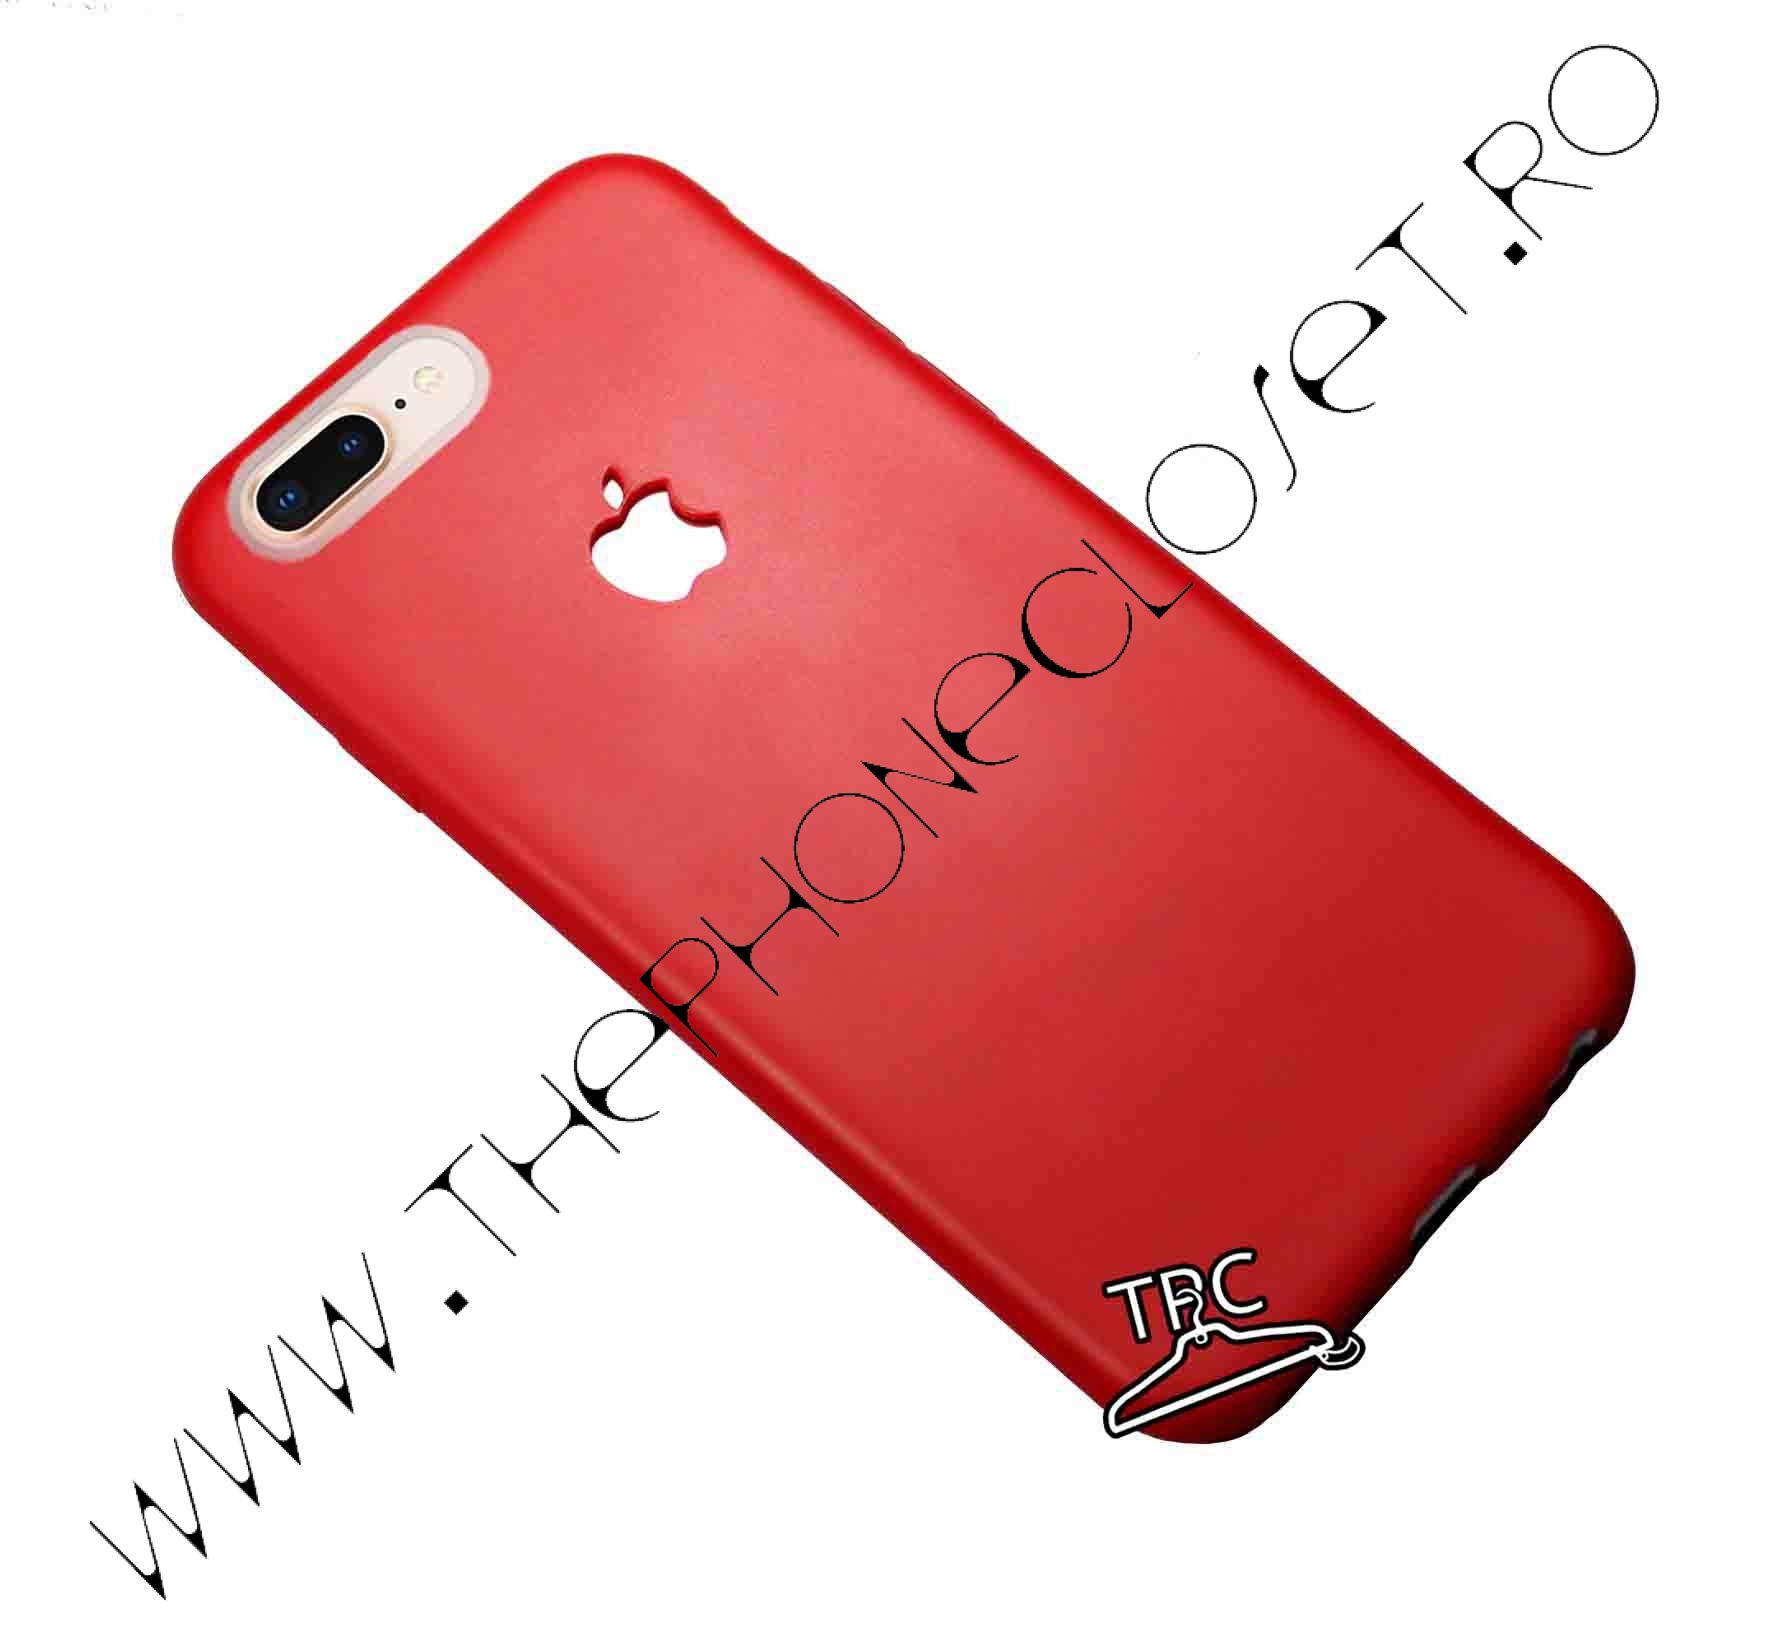 Husa din silicon dens iPhone 8 Plus logo decupat Red Mat